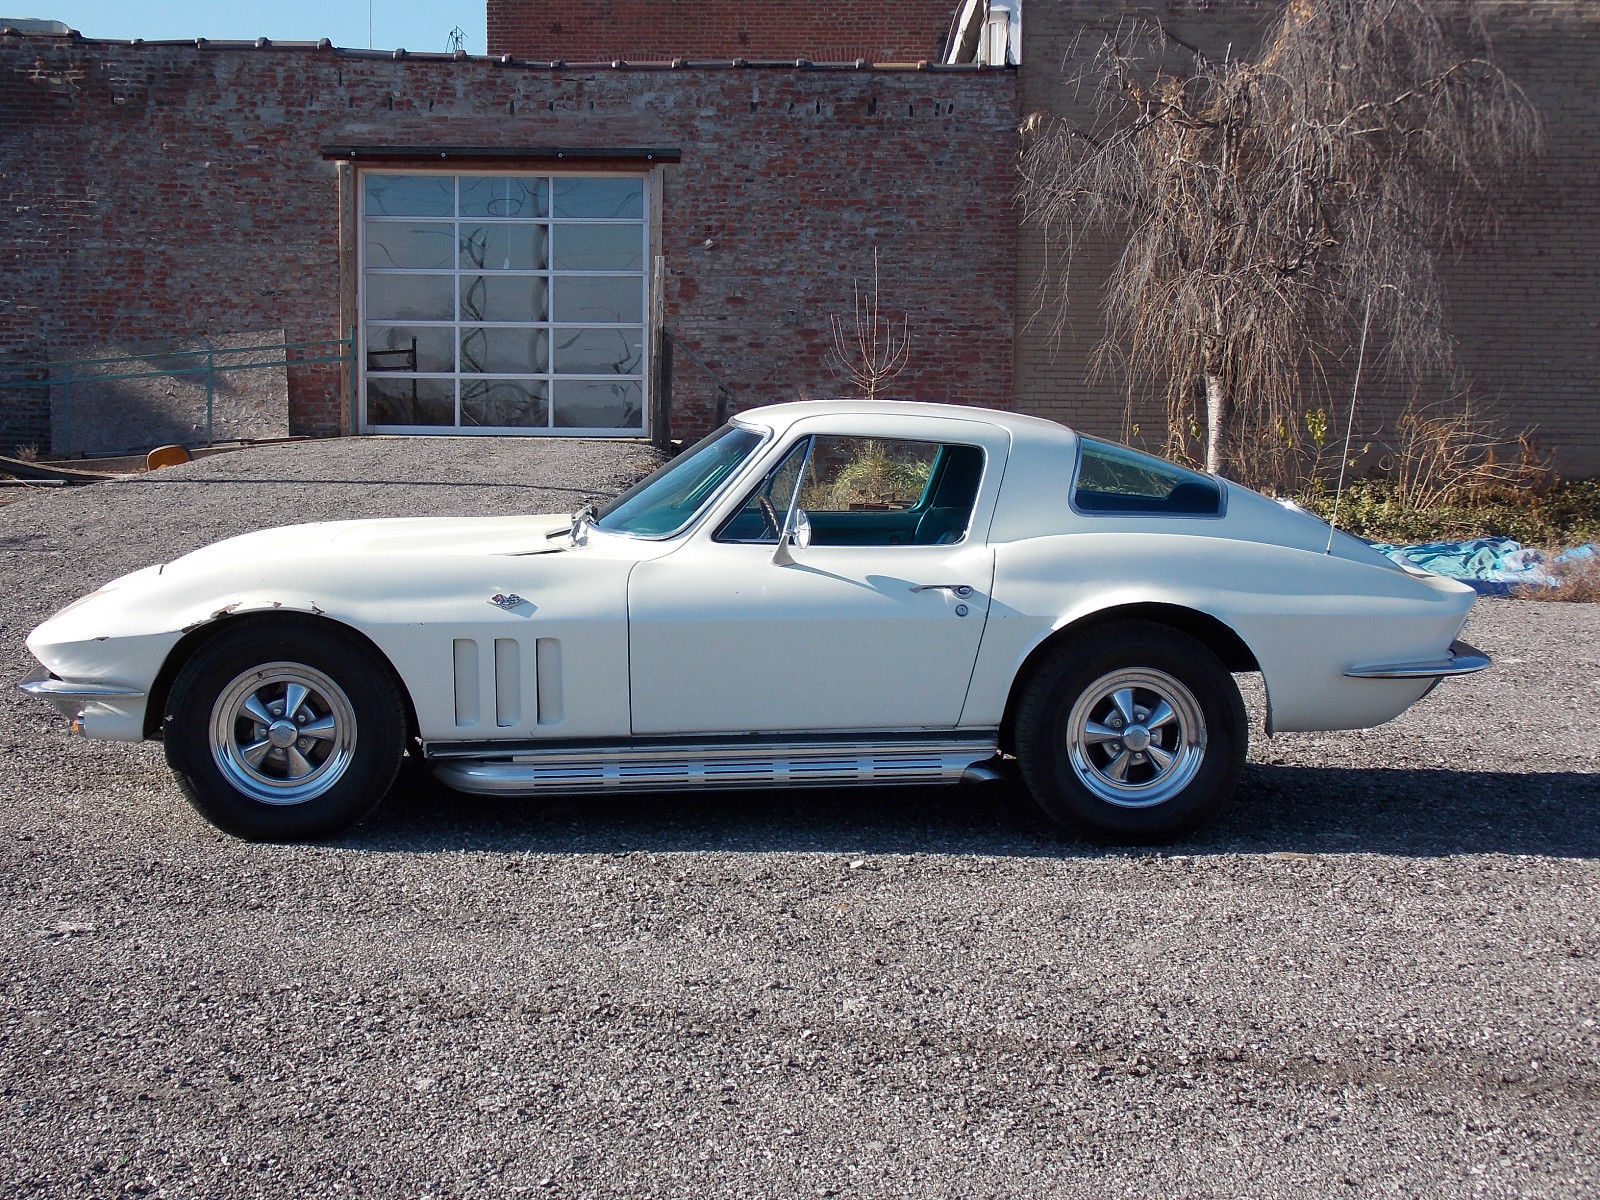 1966 Corvette Stingray California Car Great Driver Rust Free Chevy Prevnext